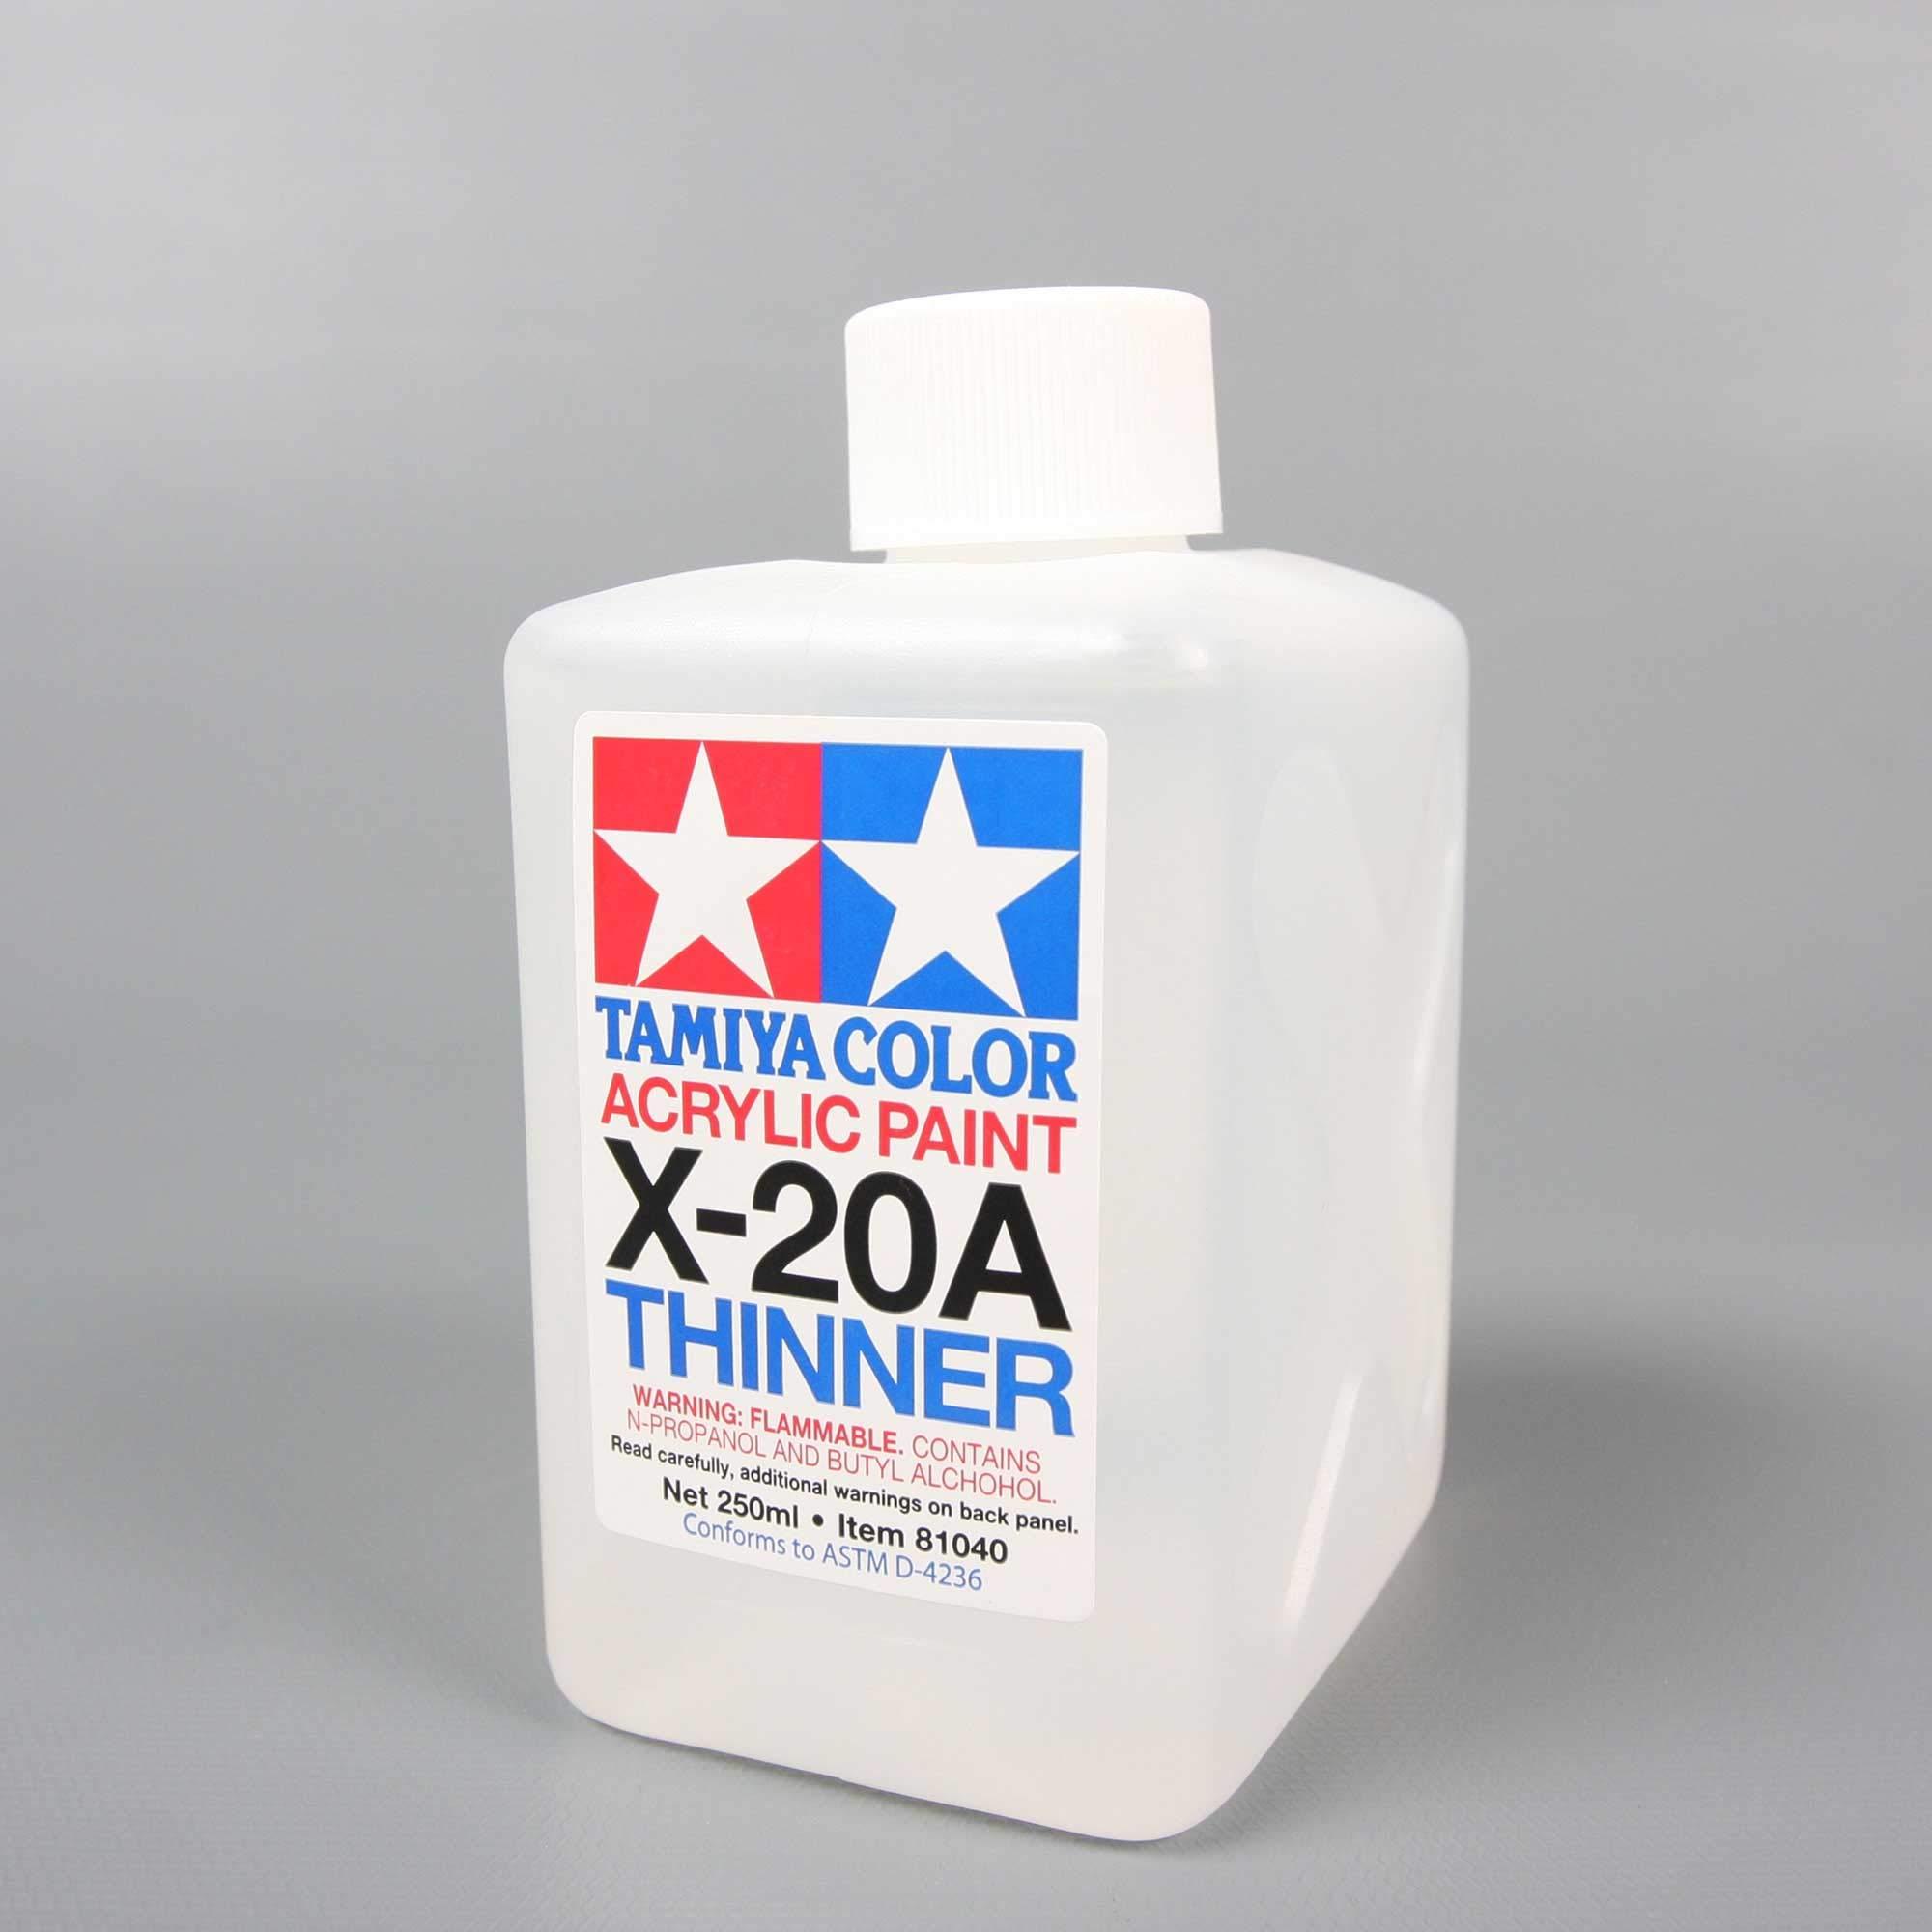 TAMIYA America, Inc Super Large Bottle Acrylic Paint, X-20A Thinner, TAM81040